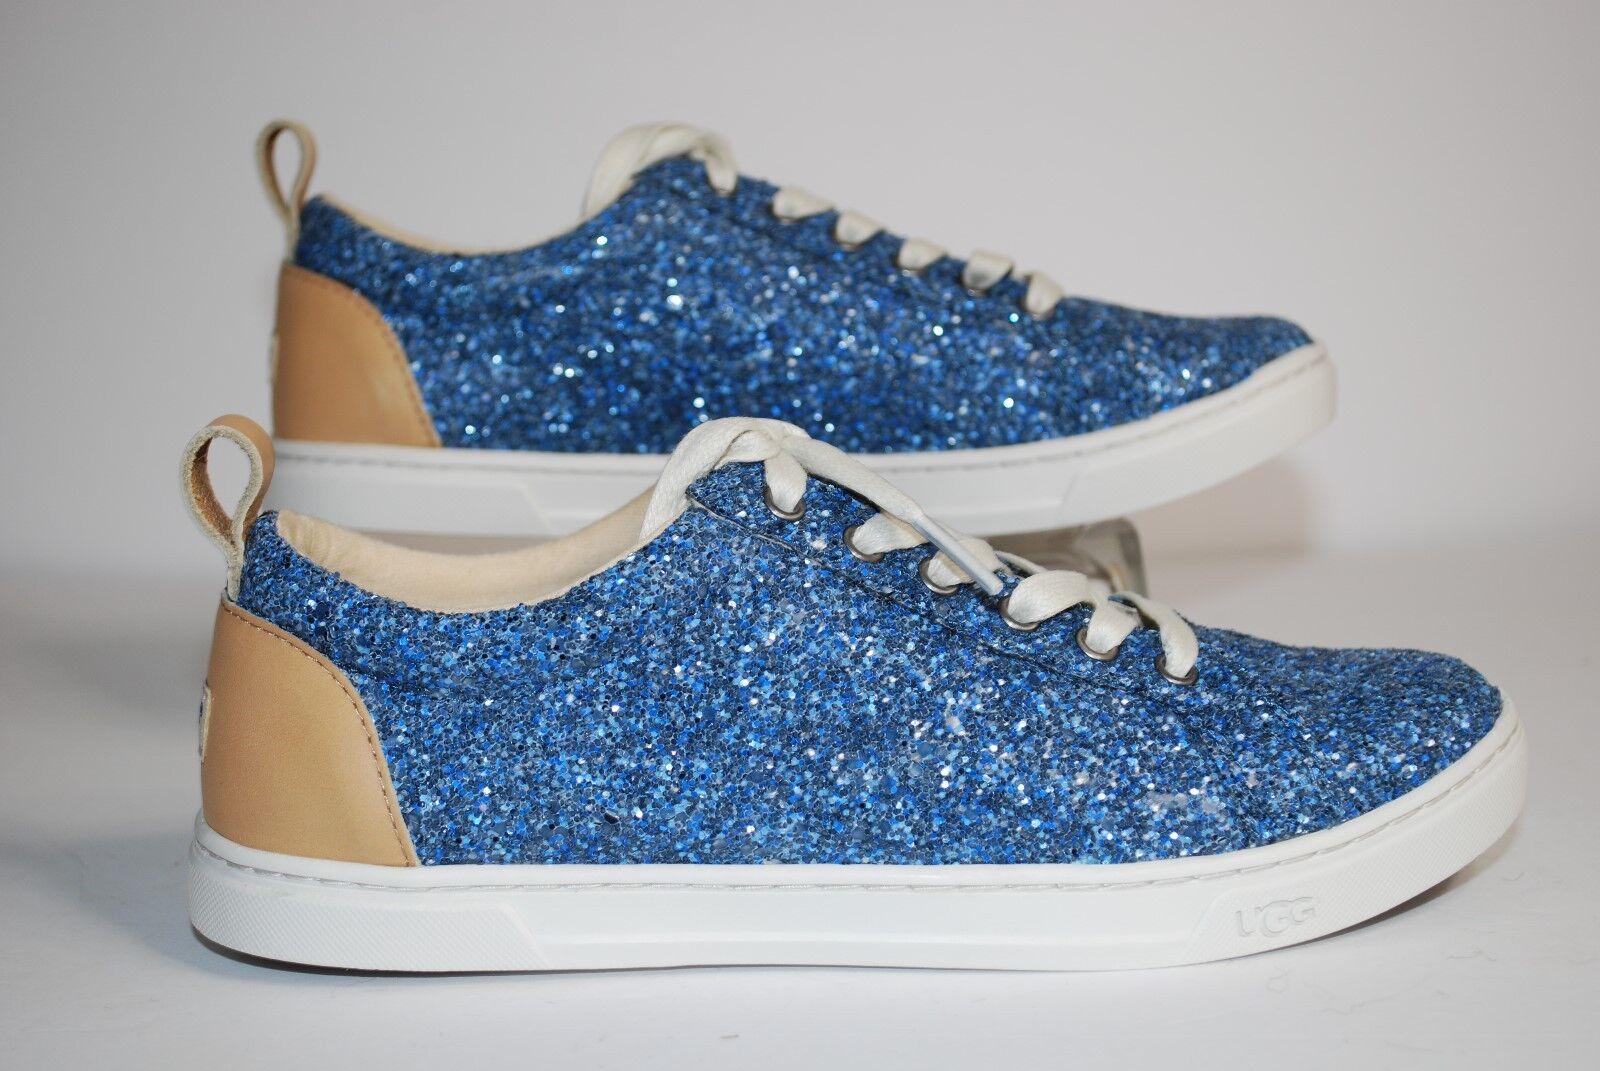 Ugg Karine Chunky Glitter Blue Multi Women Sneakers 1090012